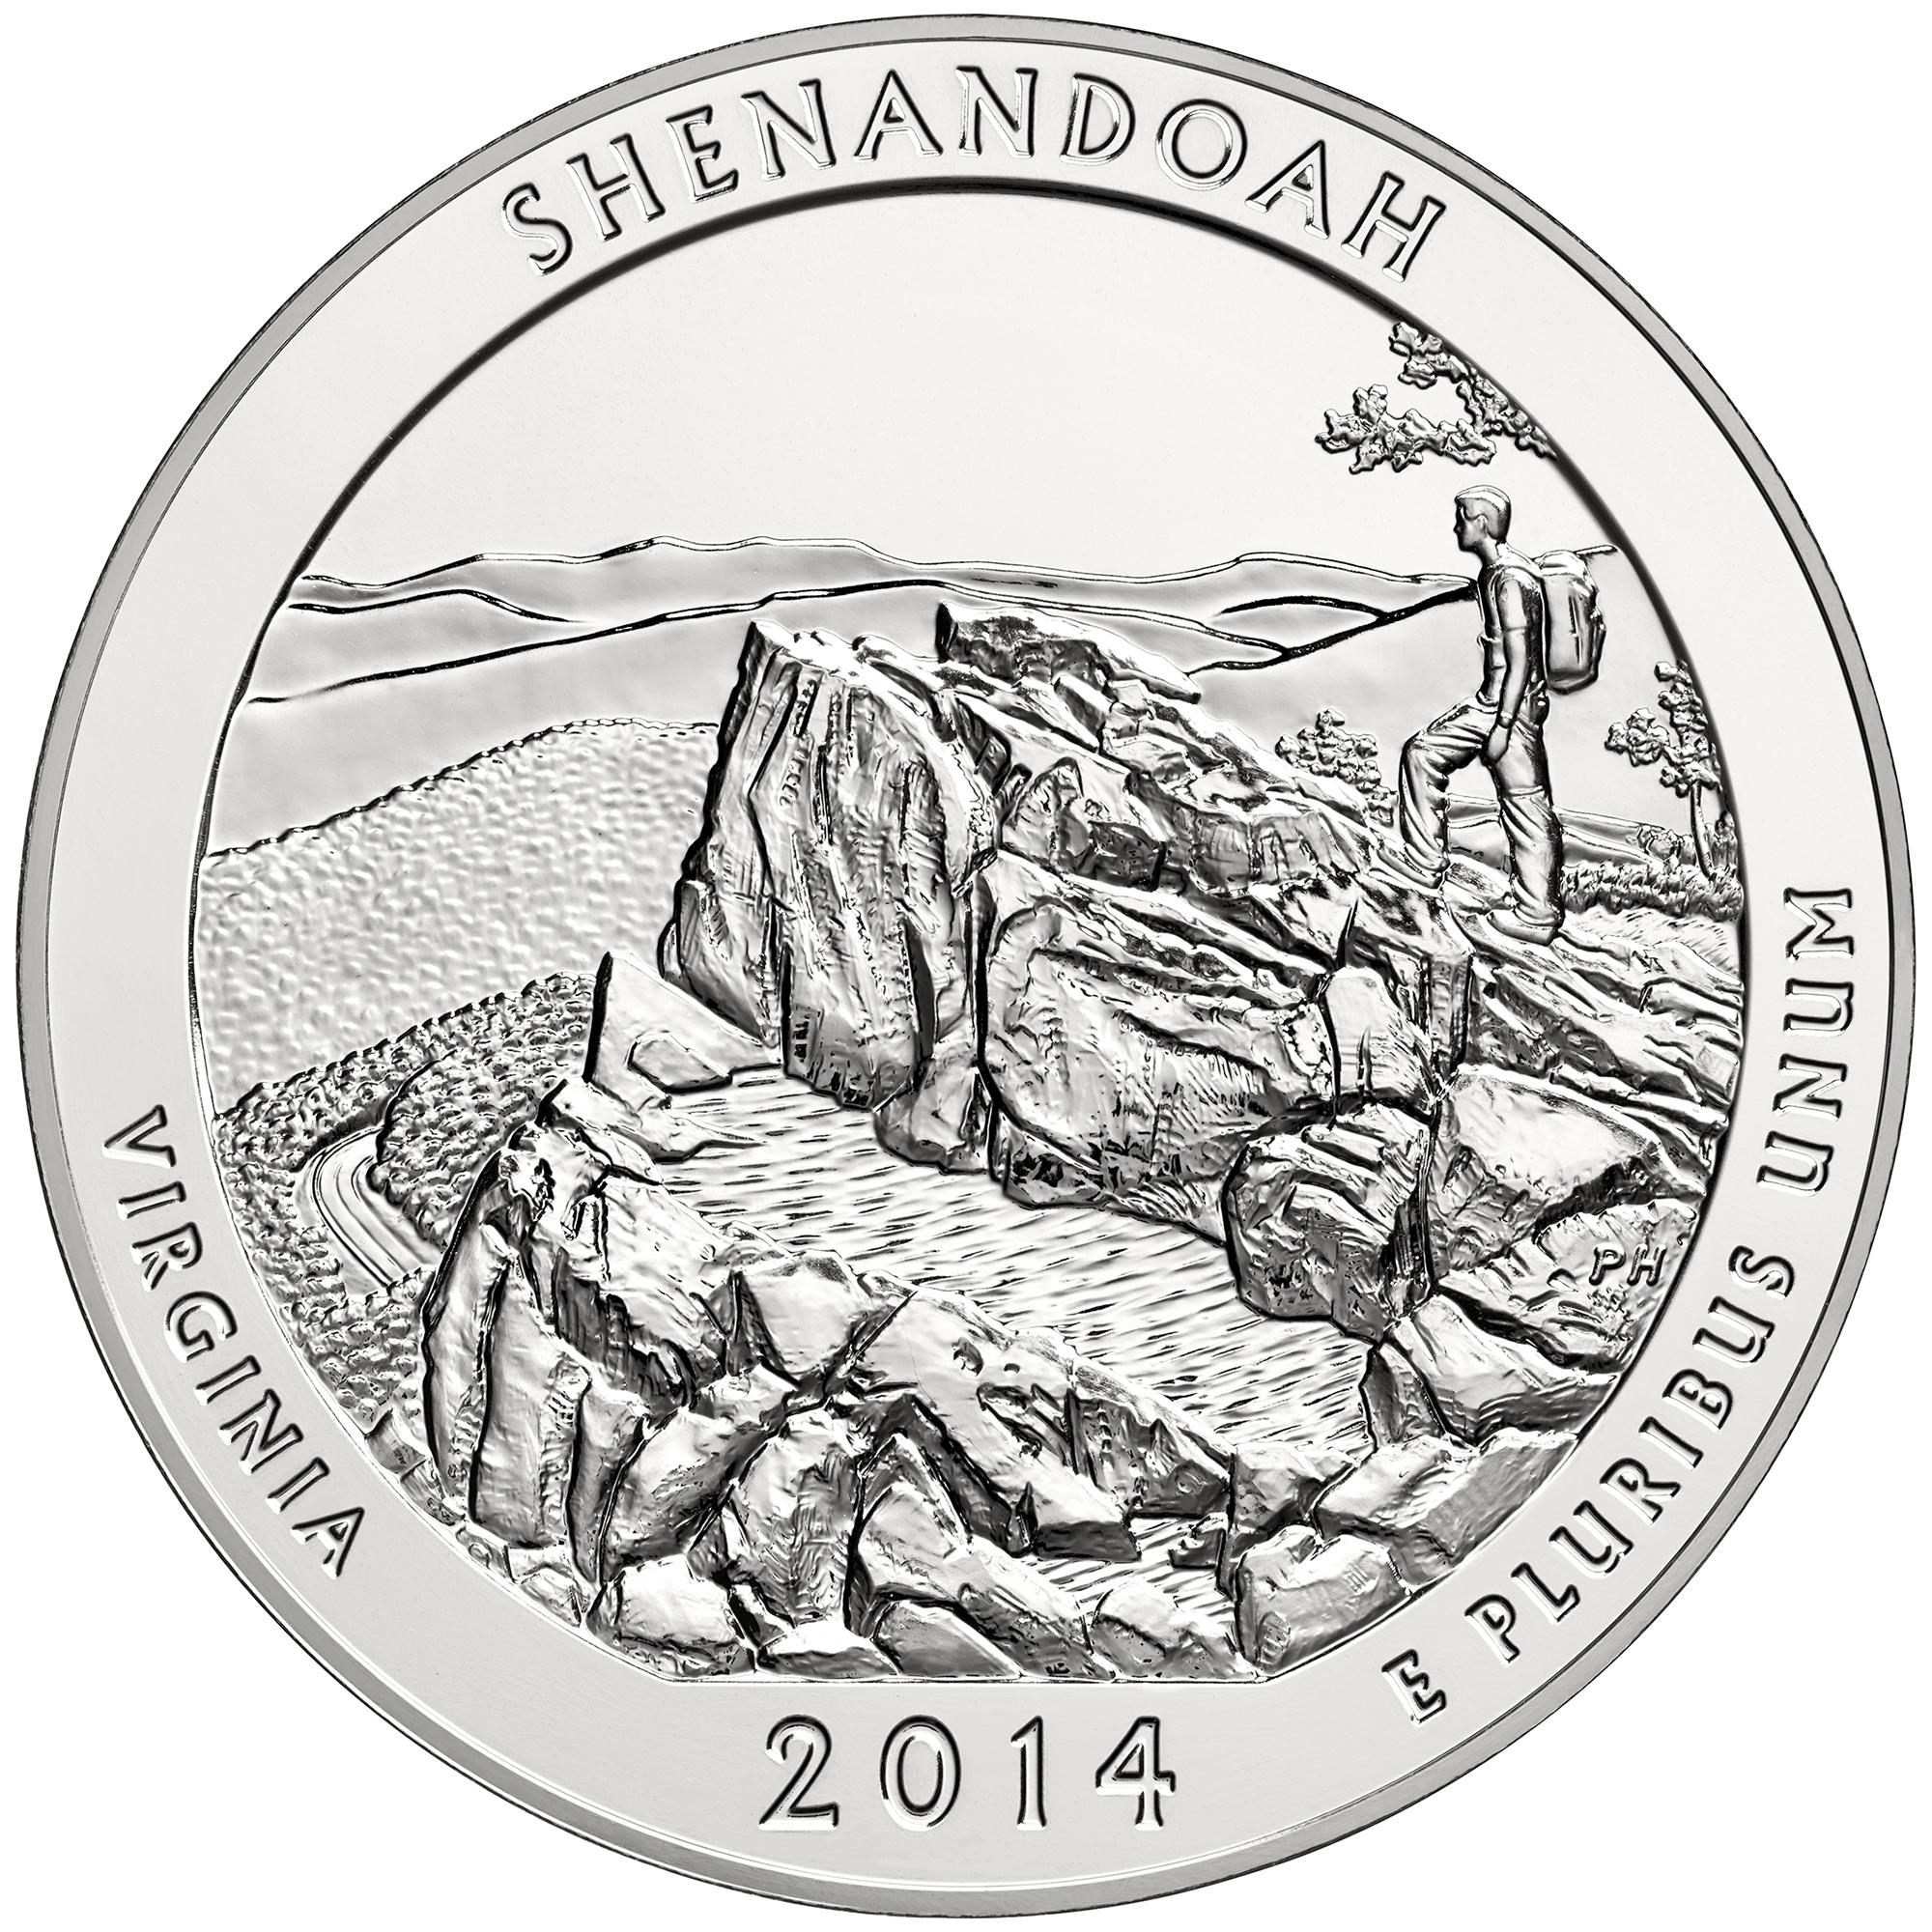 2014 America The Beautiful Quarters Five Ounce Silver Bullion Coin Shenandoah Virginia Reverse